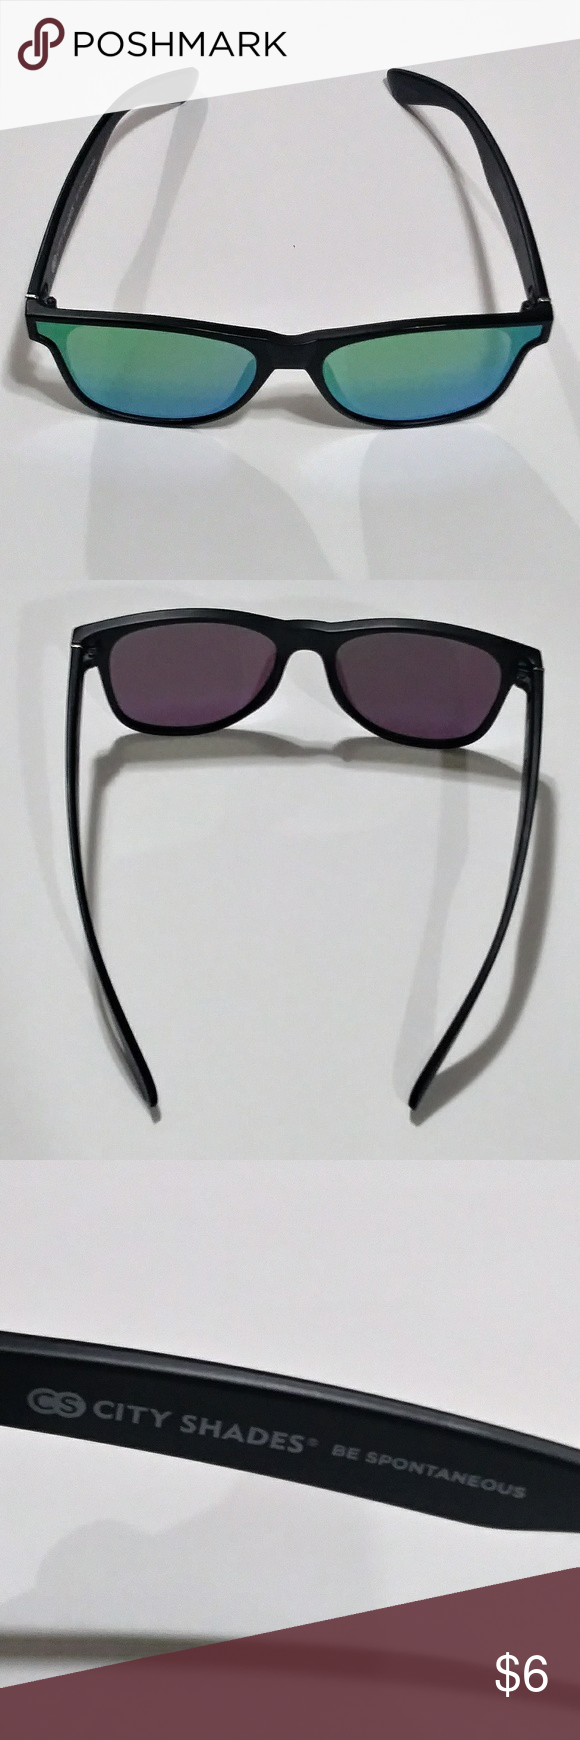 City Shades Sunglasses Sunglasses Shades Sunglasses Sunglasses Accessories